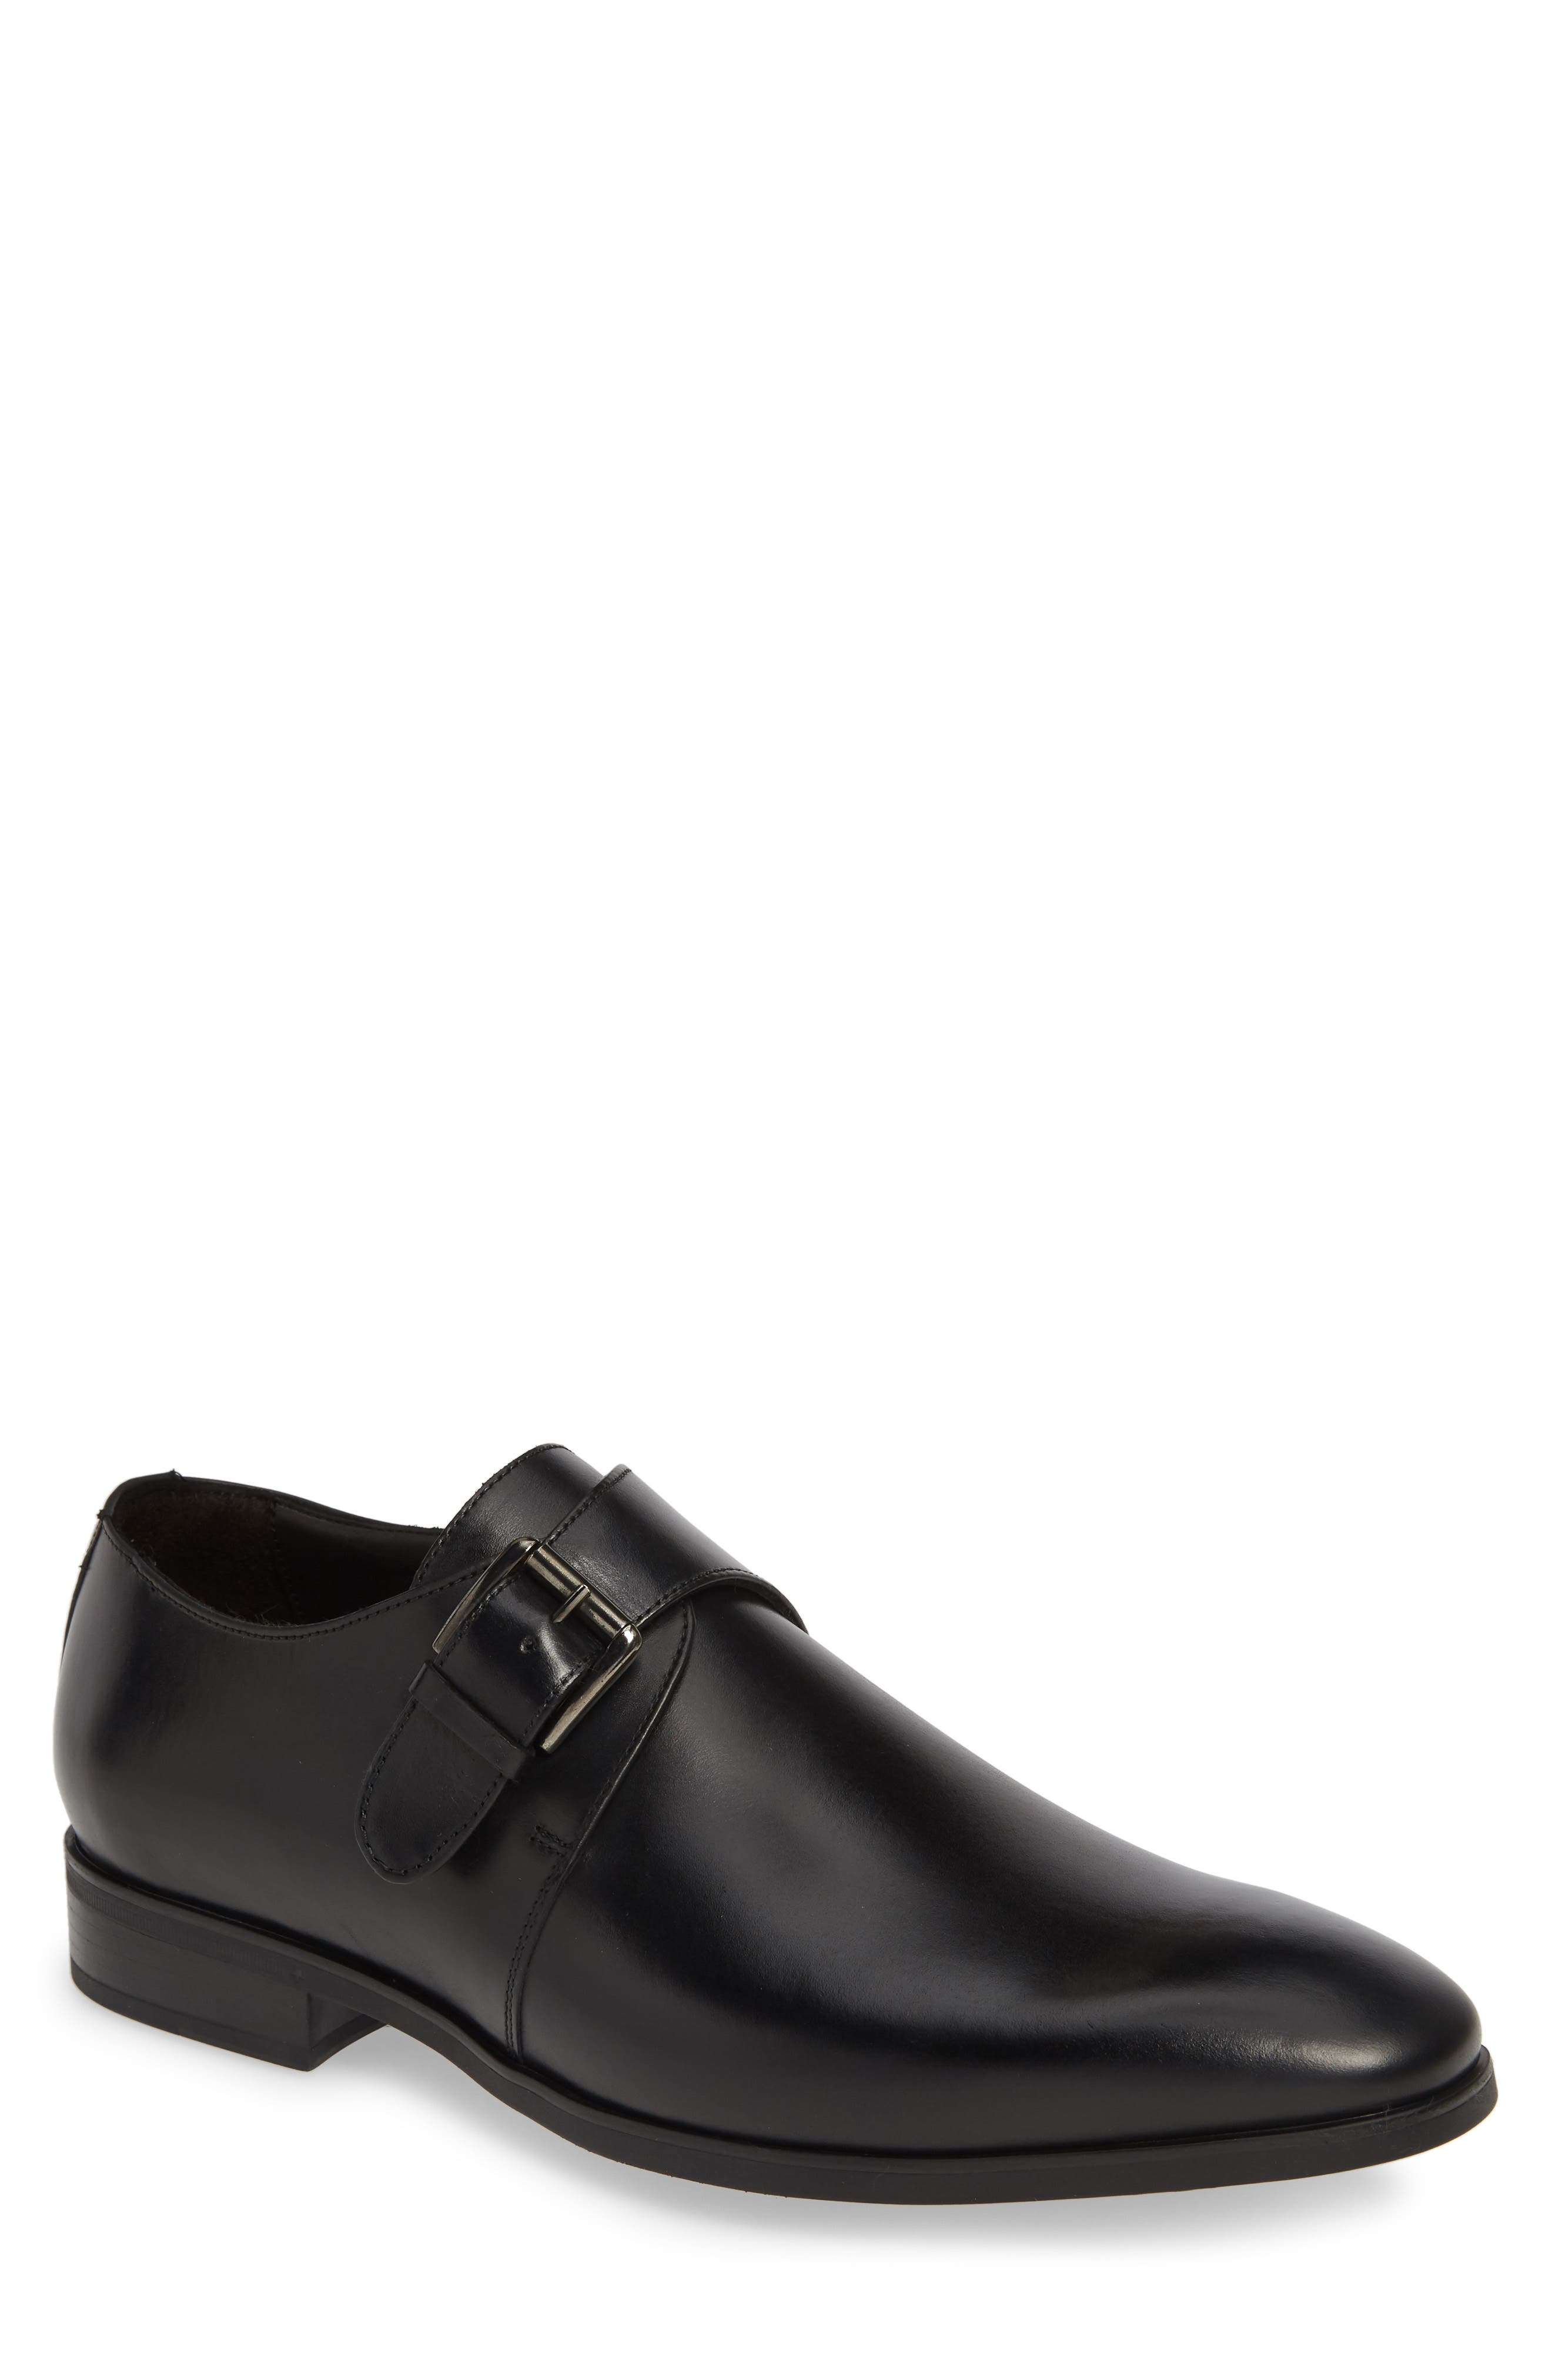 Scarpa Monk Strap Shoe, Main, color, BLACK LEATHER